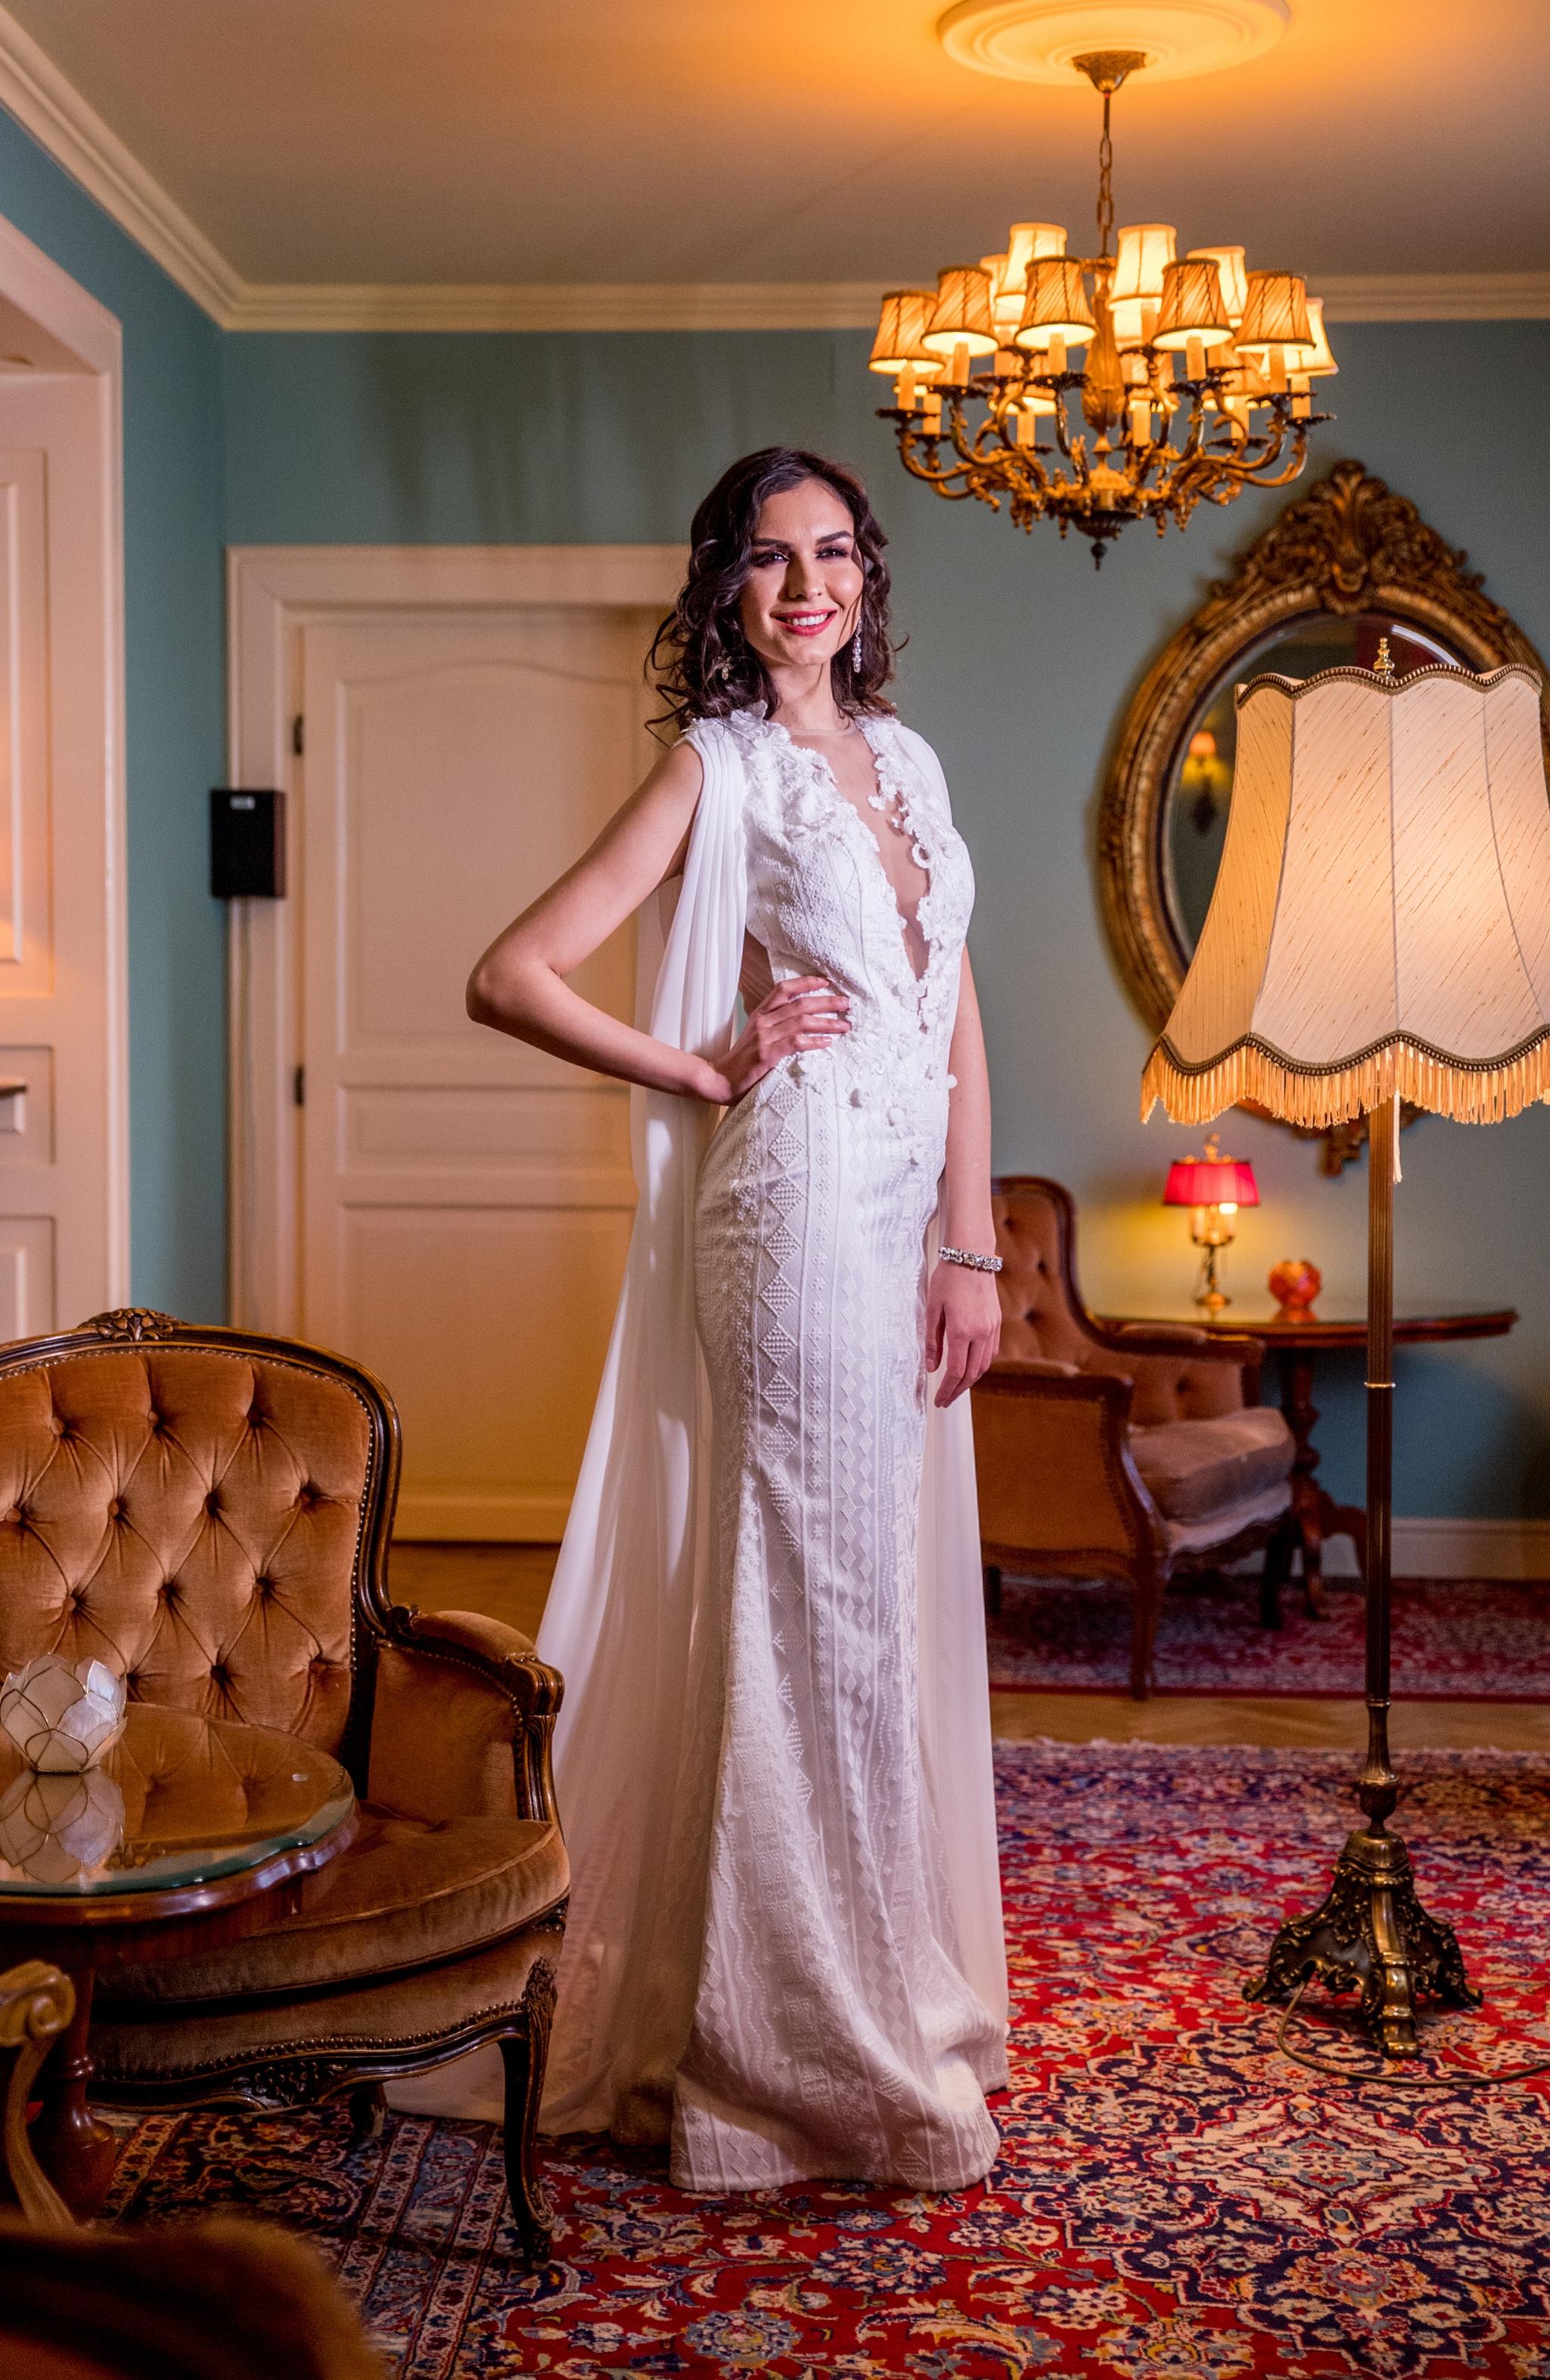 2018 wedding dresses fashion by laina (31).jpg